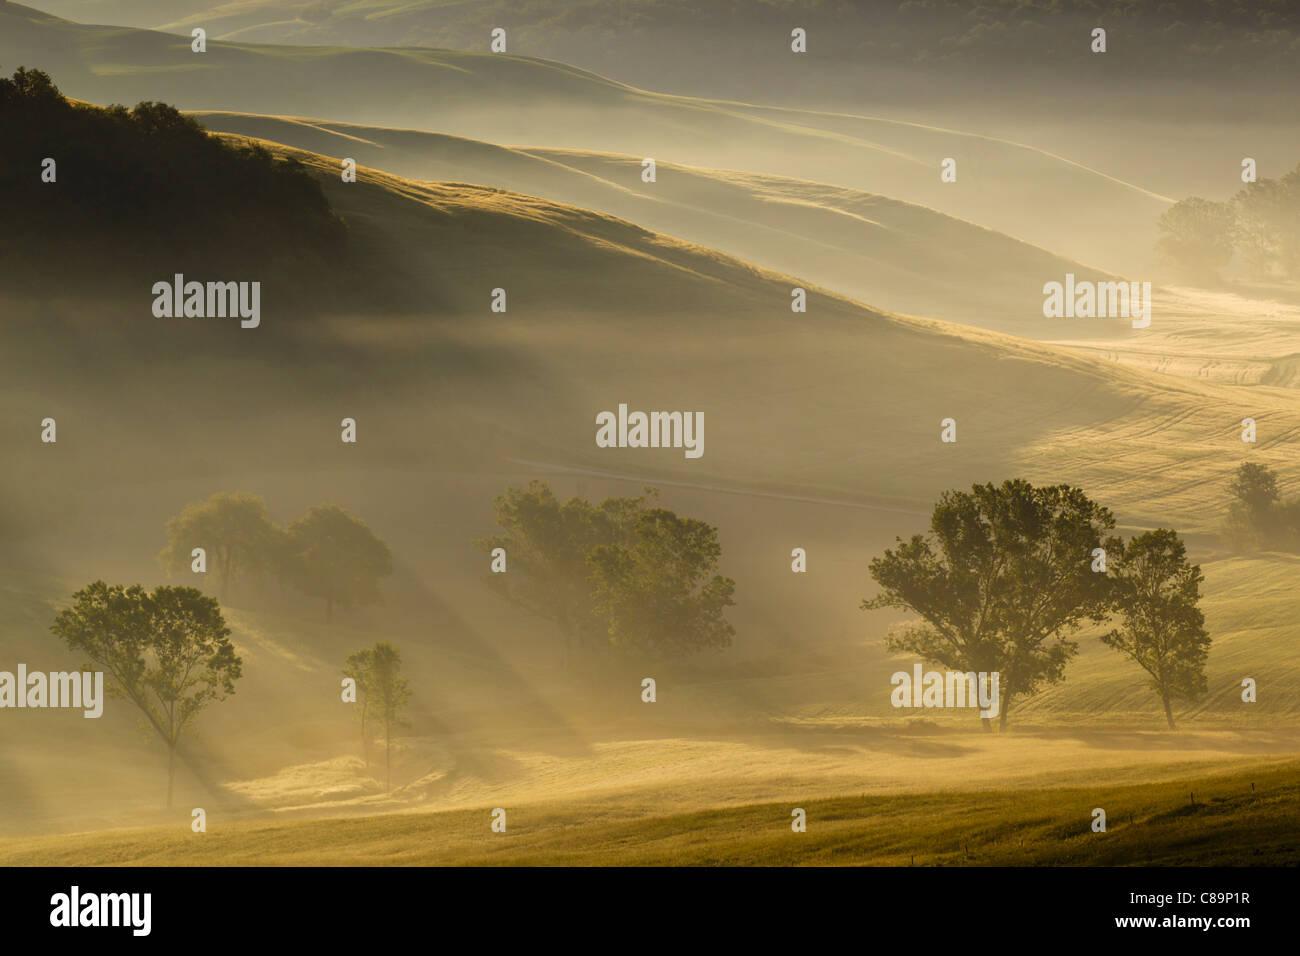 Italien, Toskana, Kreta, Blick auf Bäume und Nebel in den Morgen Stockbild